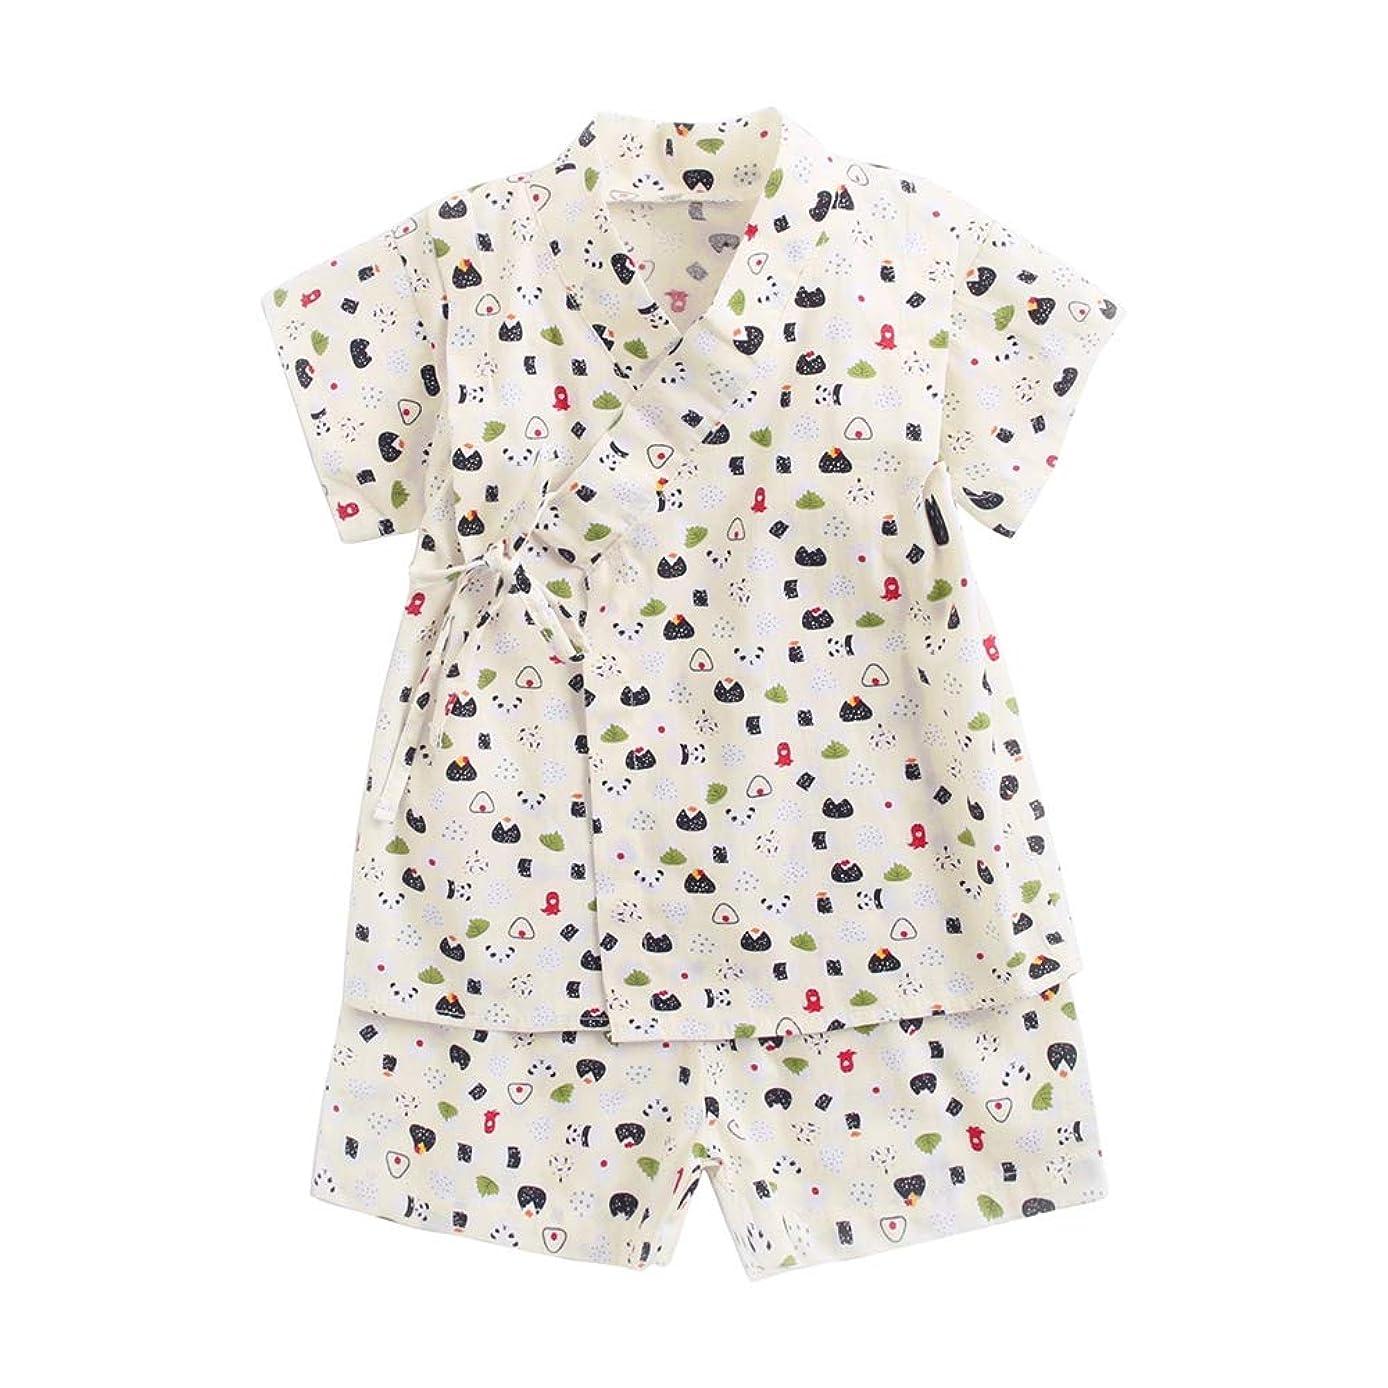 LJYH Baby Boys Girls Kimono Shirt and Shorts Cotton Pajamas Sets